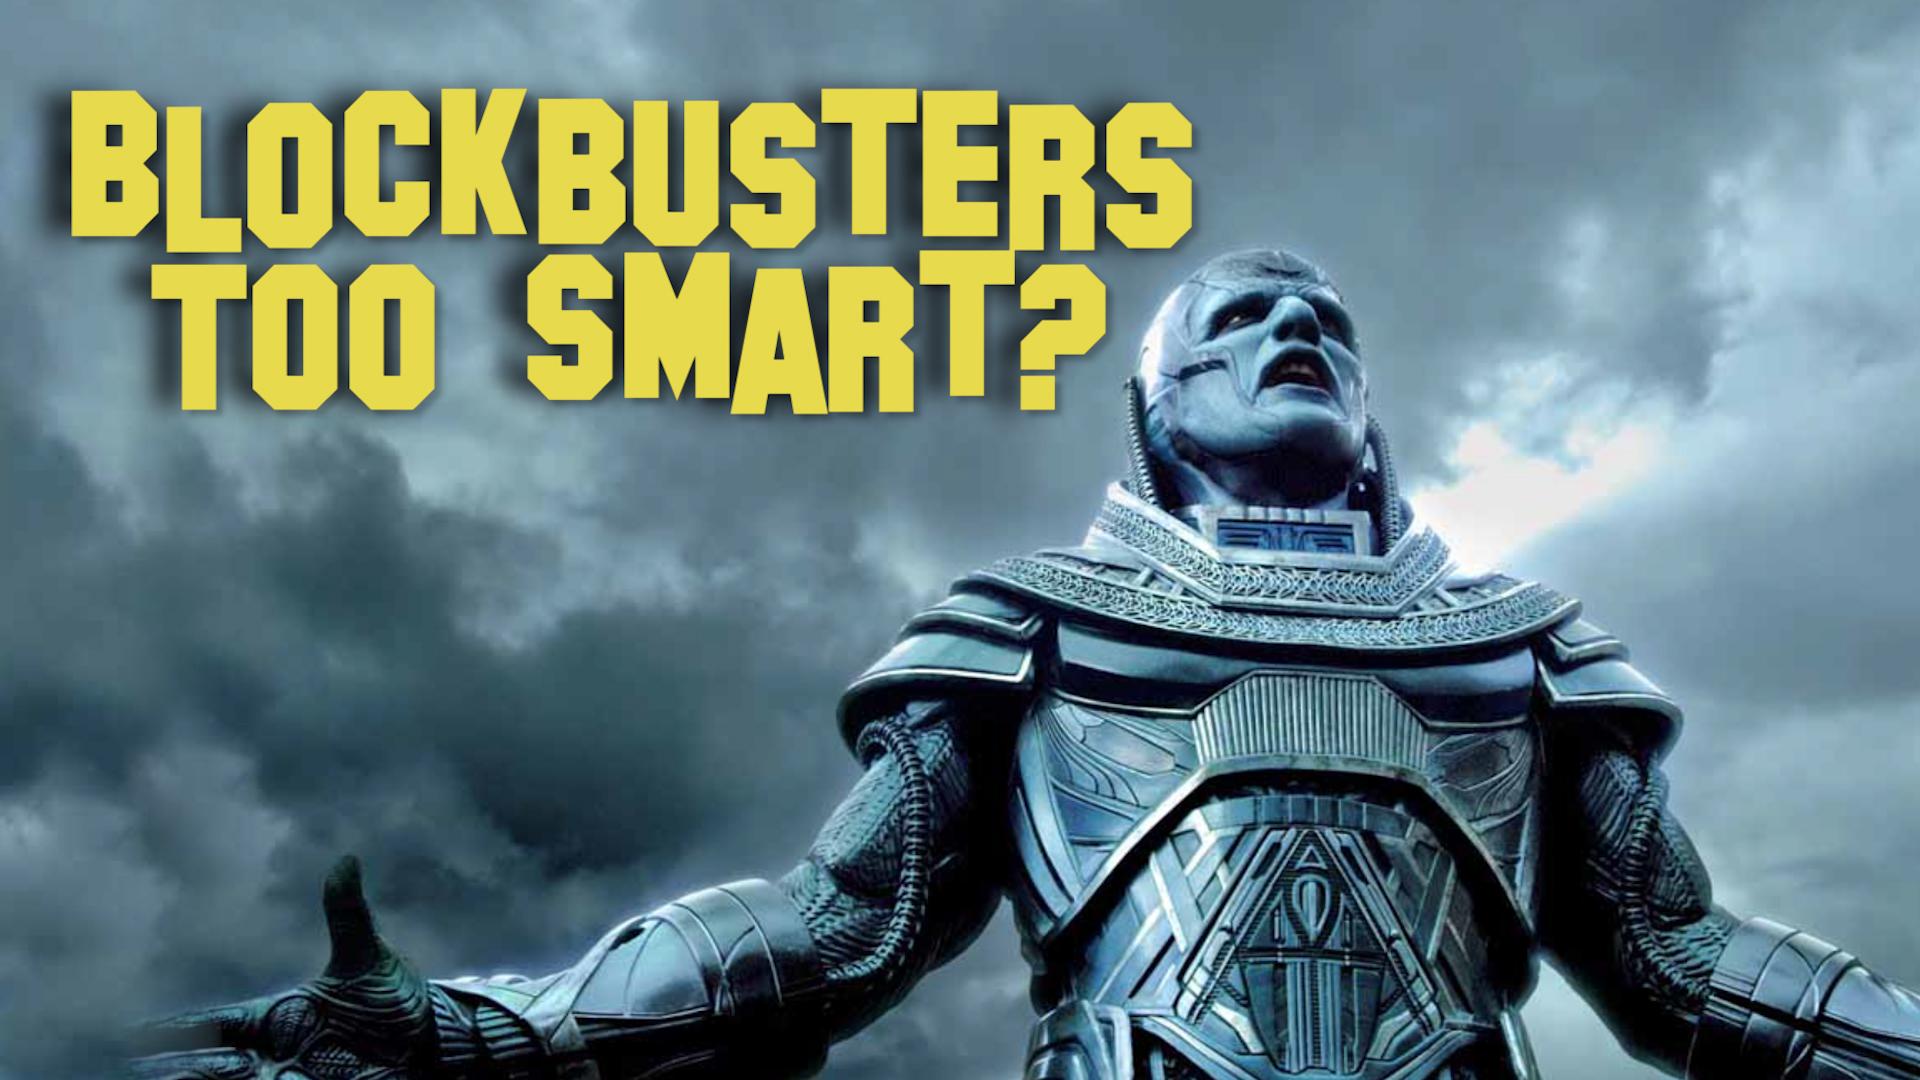 Blockbusters too smart